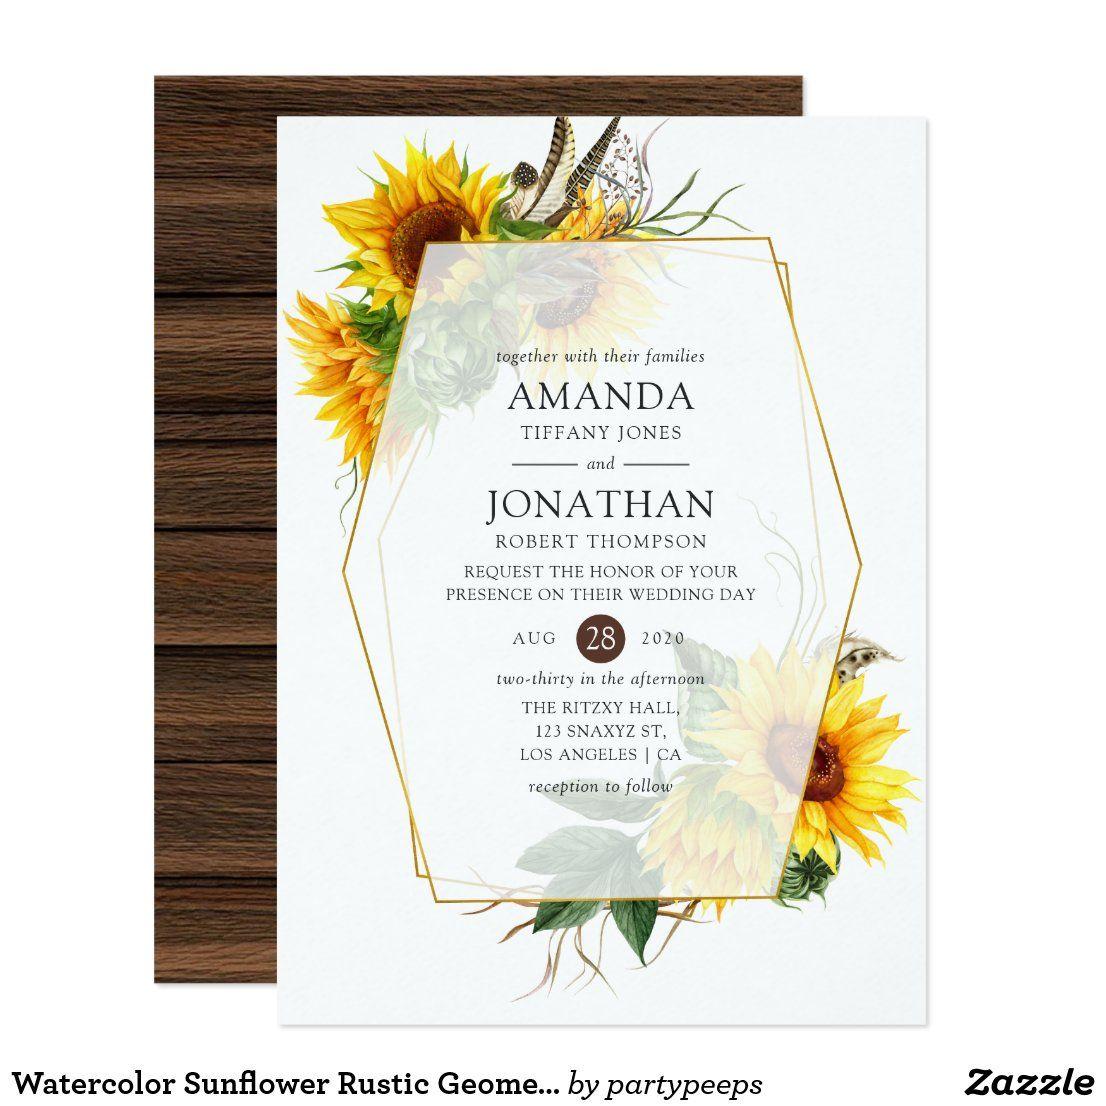 Watercolor Sunflower Rustic Geometric Wedding Invitation